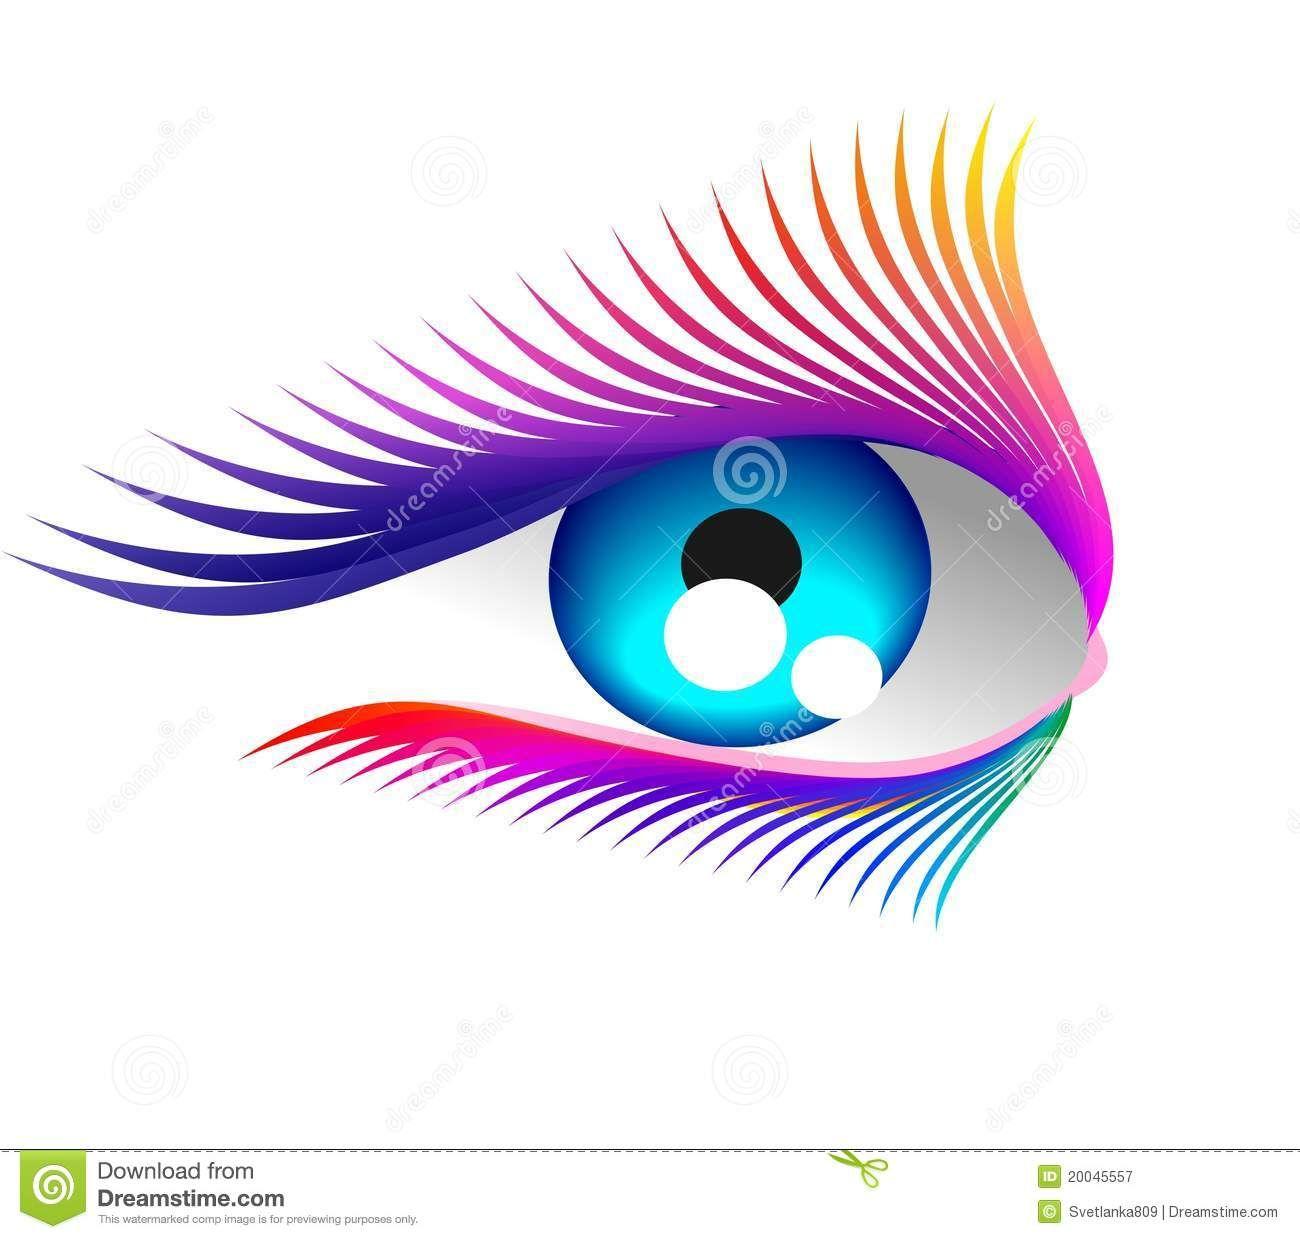 Eyelash clipart eye candy. Extension logo free clip